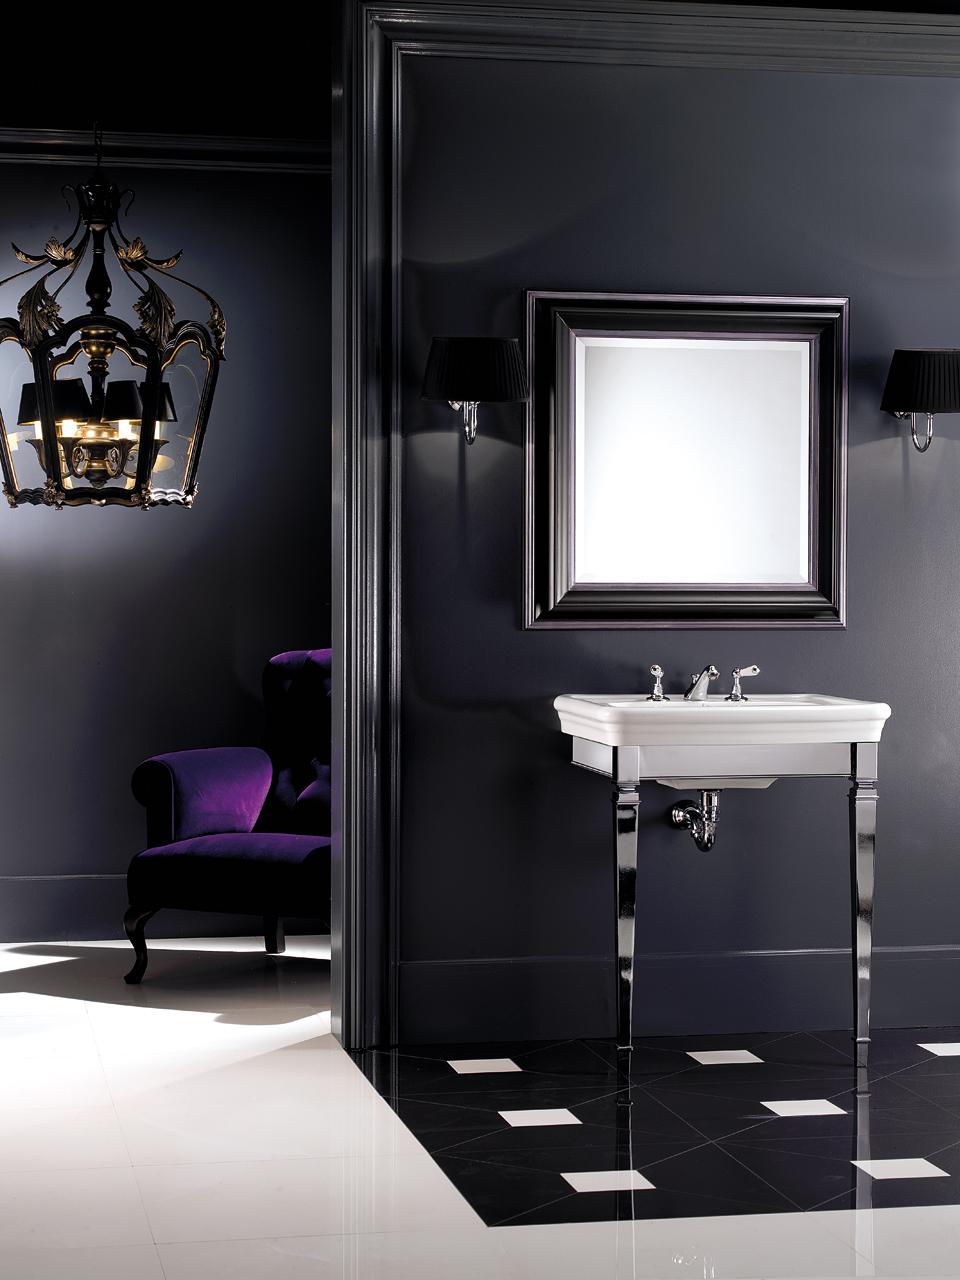 Classic Bathrooms: Devon & Devon: Duke-Ambient